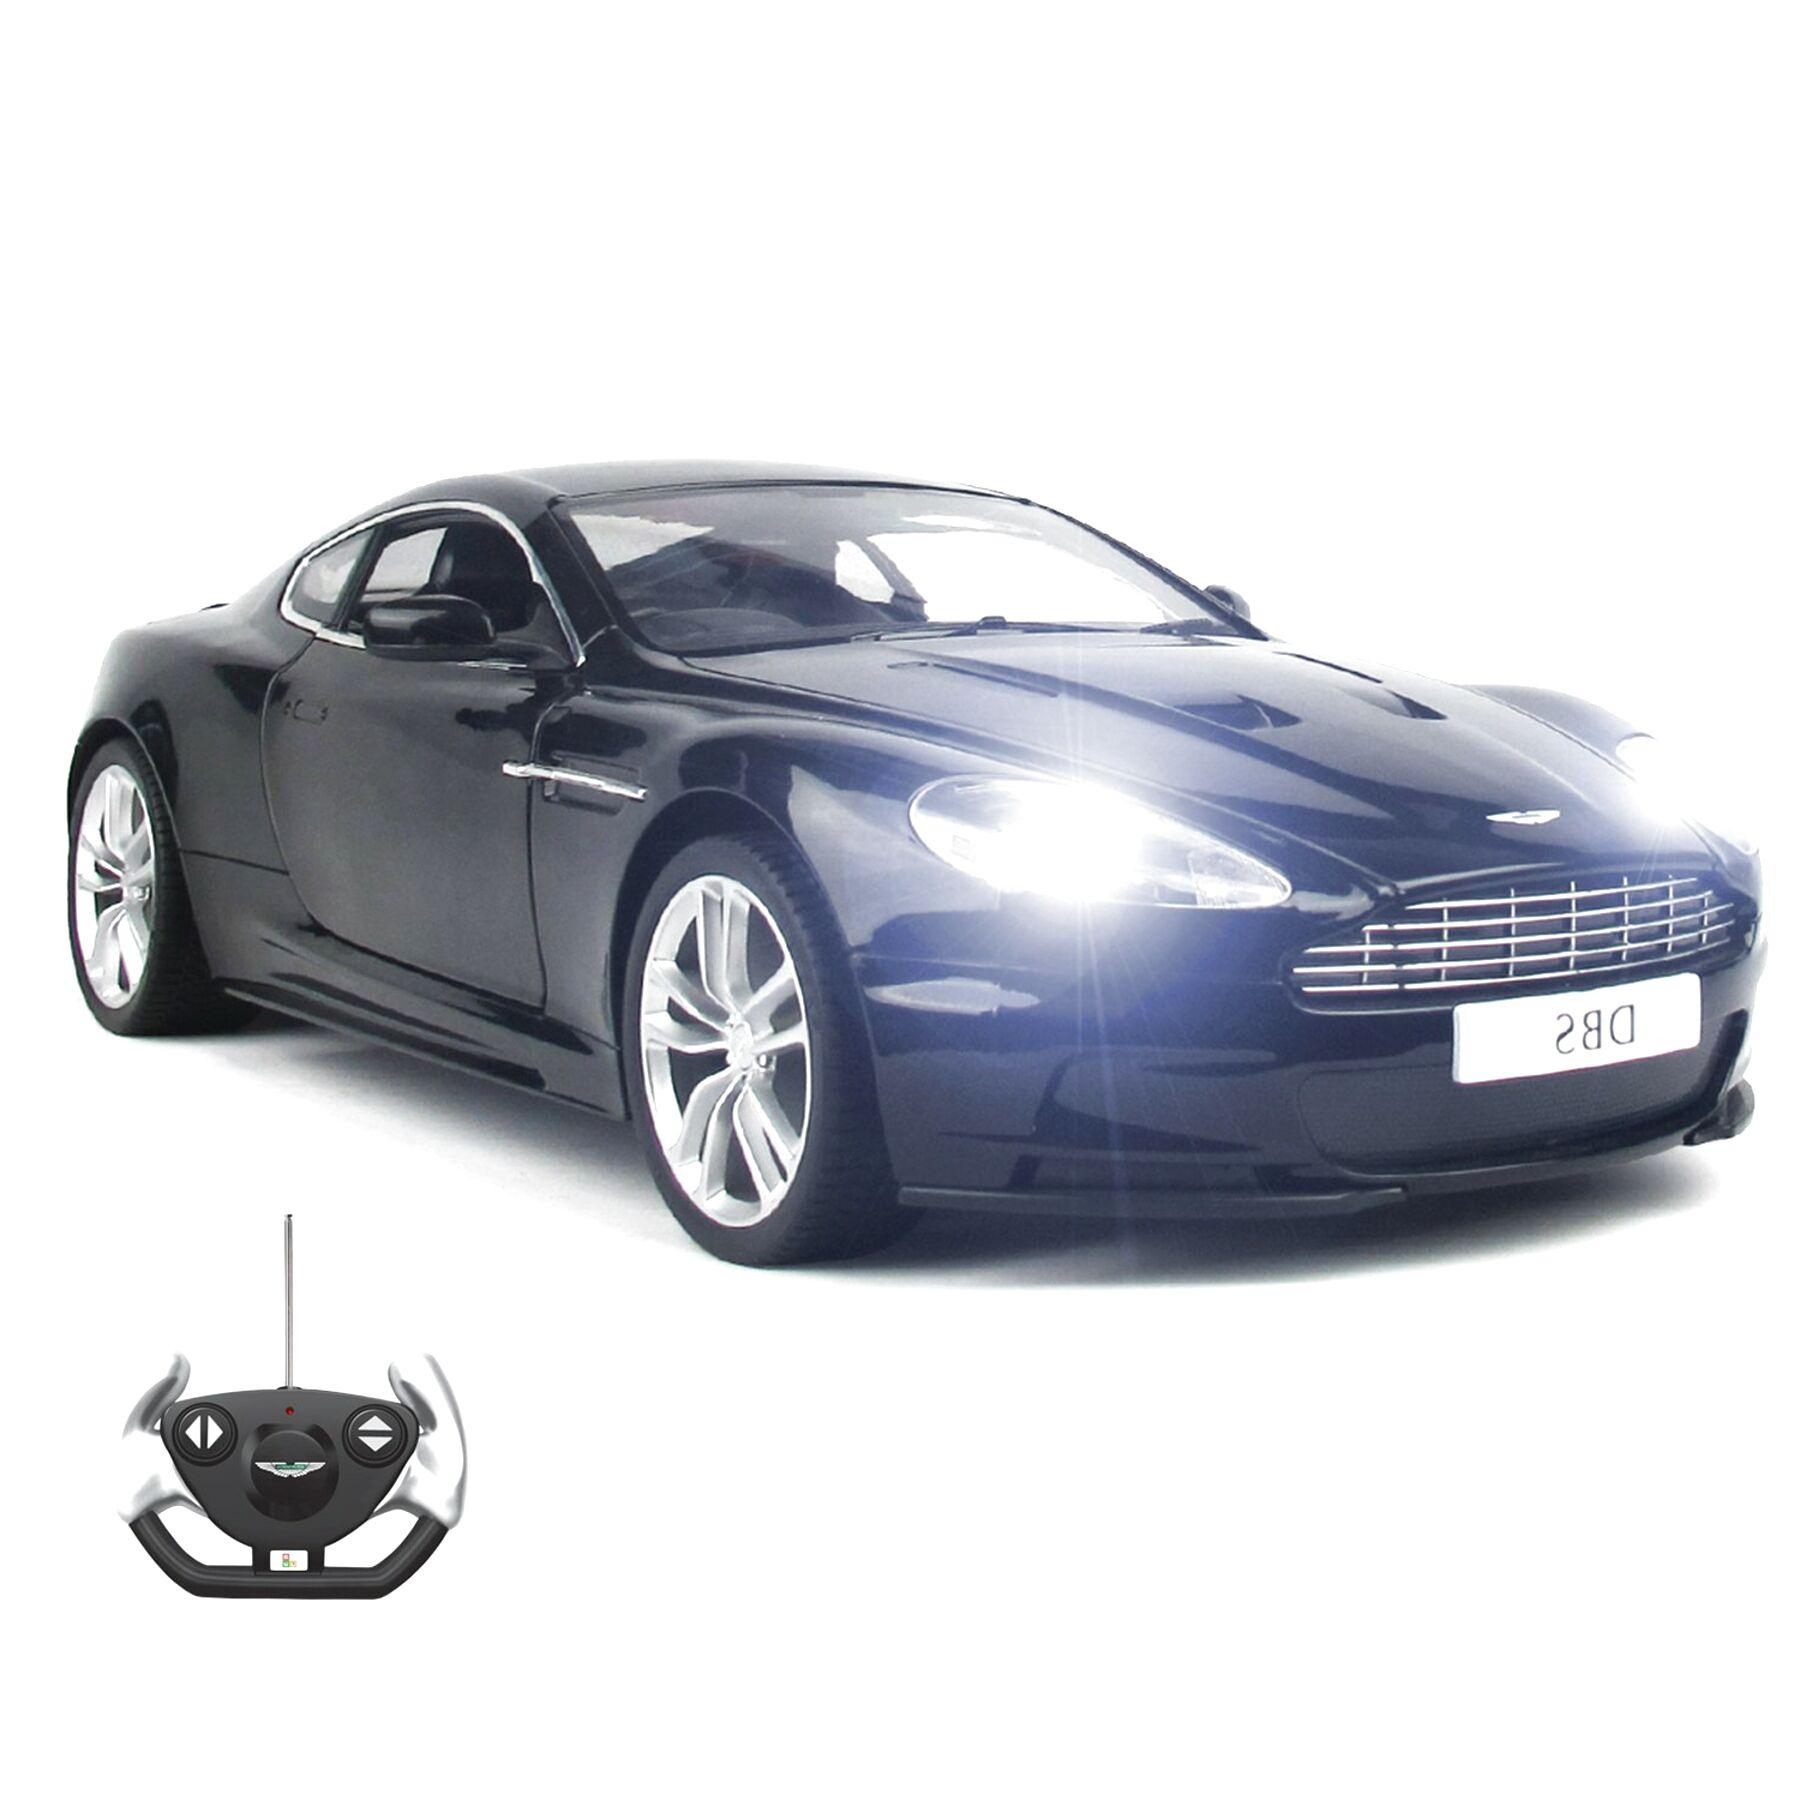 Aston Martin Radio Controlled Car For Sale In UK